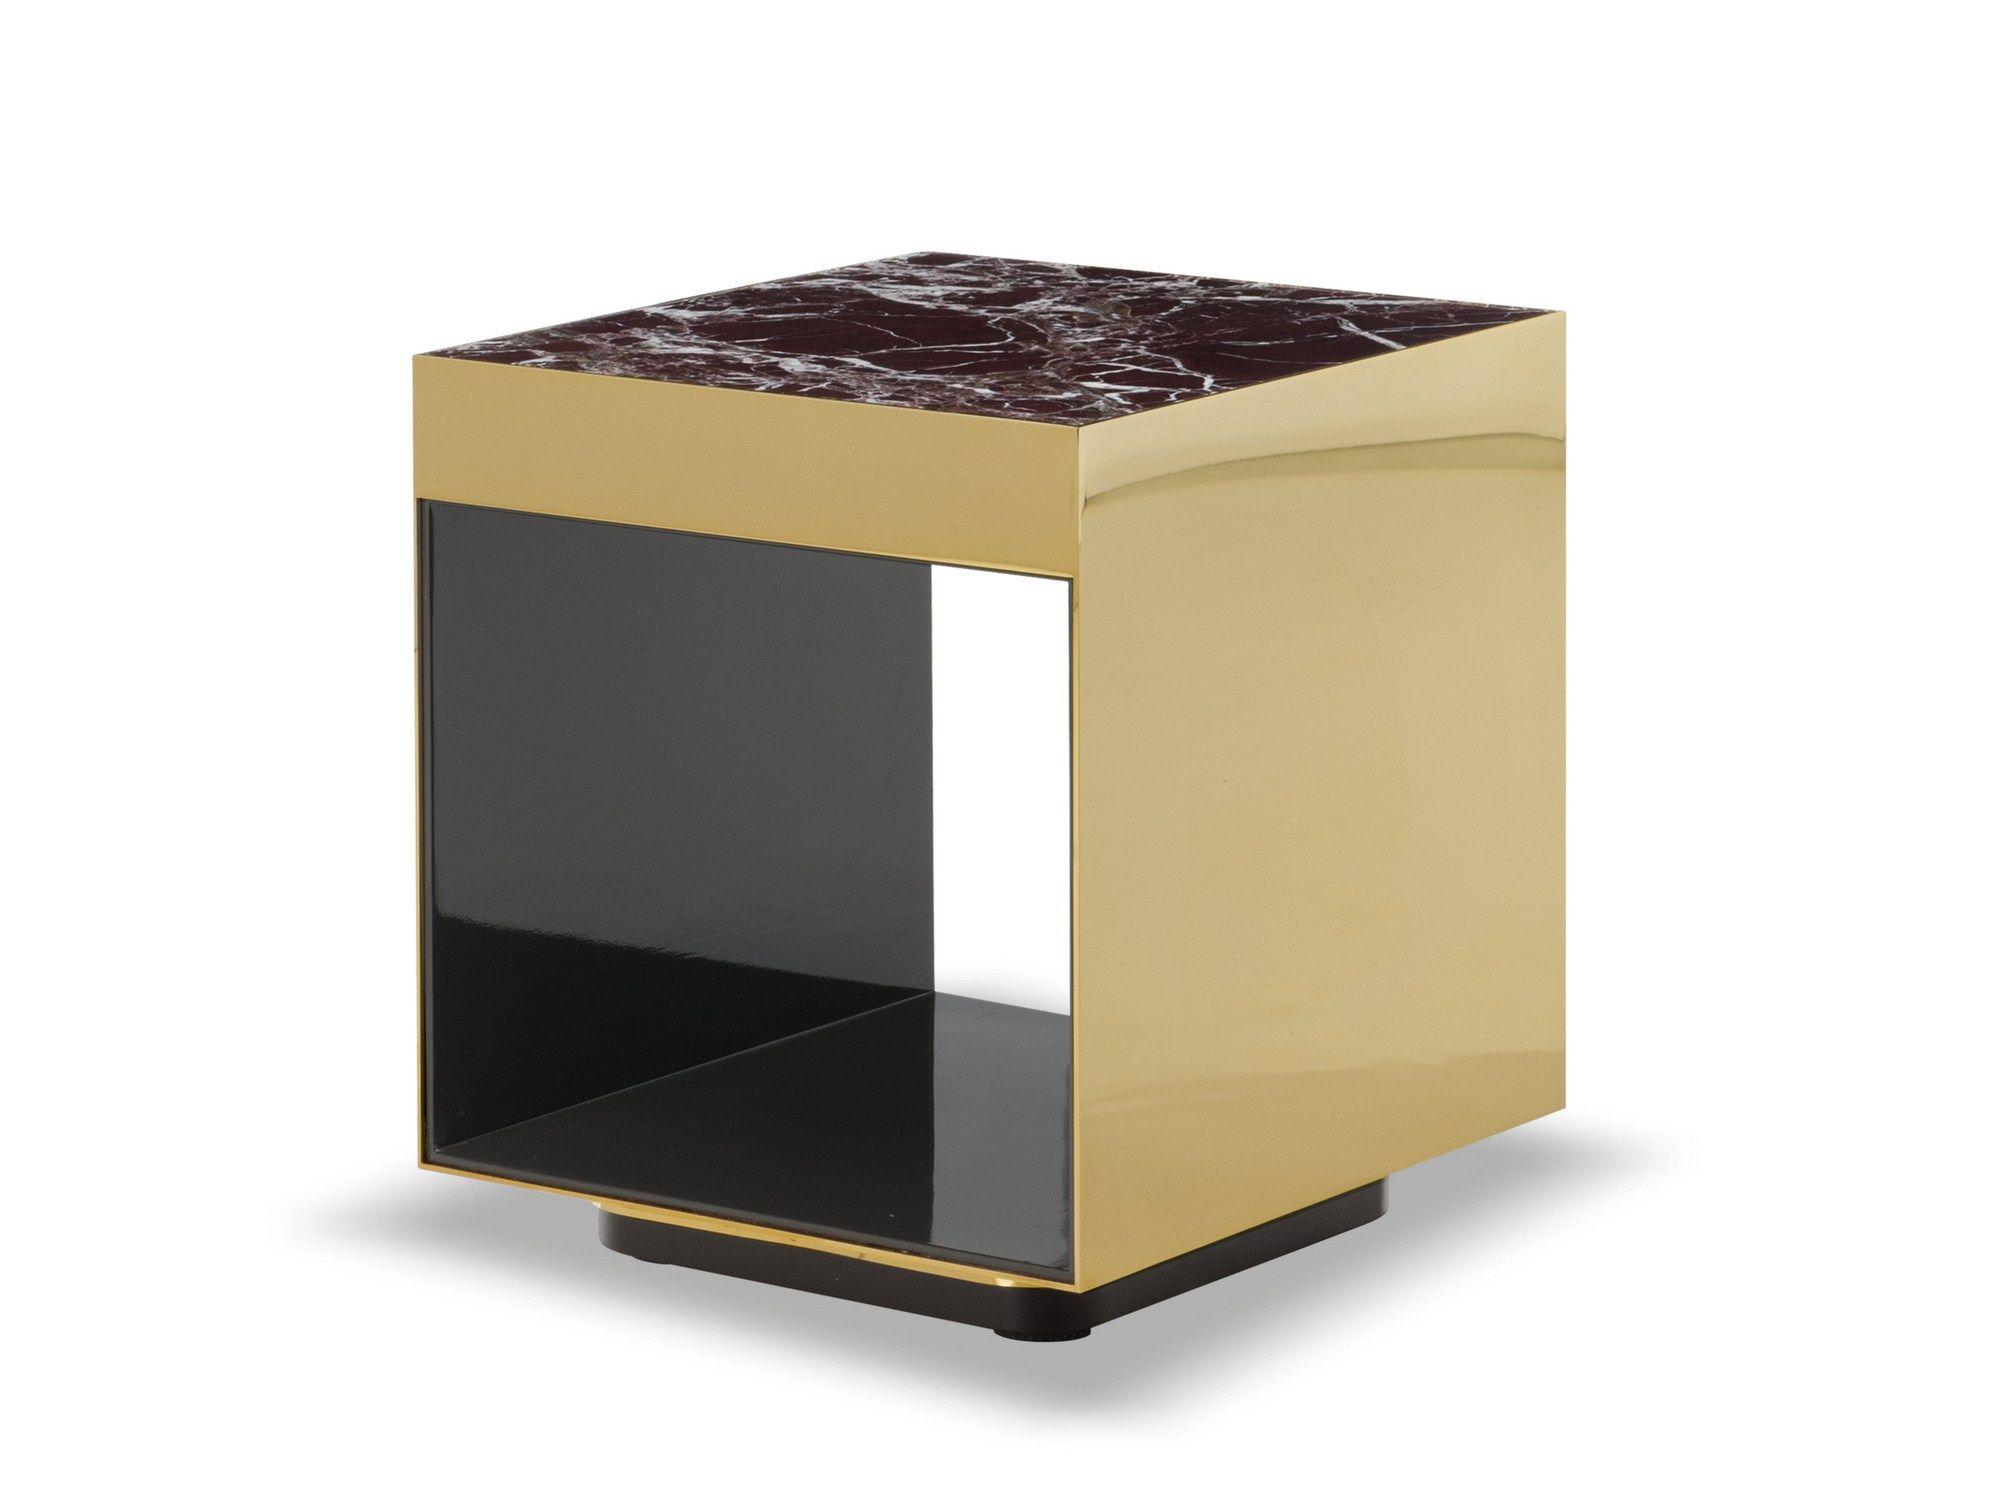 ELLIOT by Minotti design Rodolfo Dordoni Tables